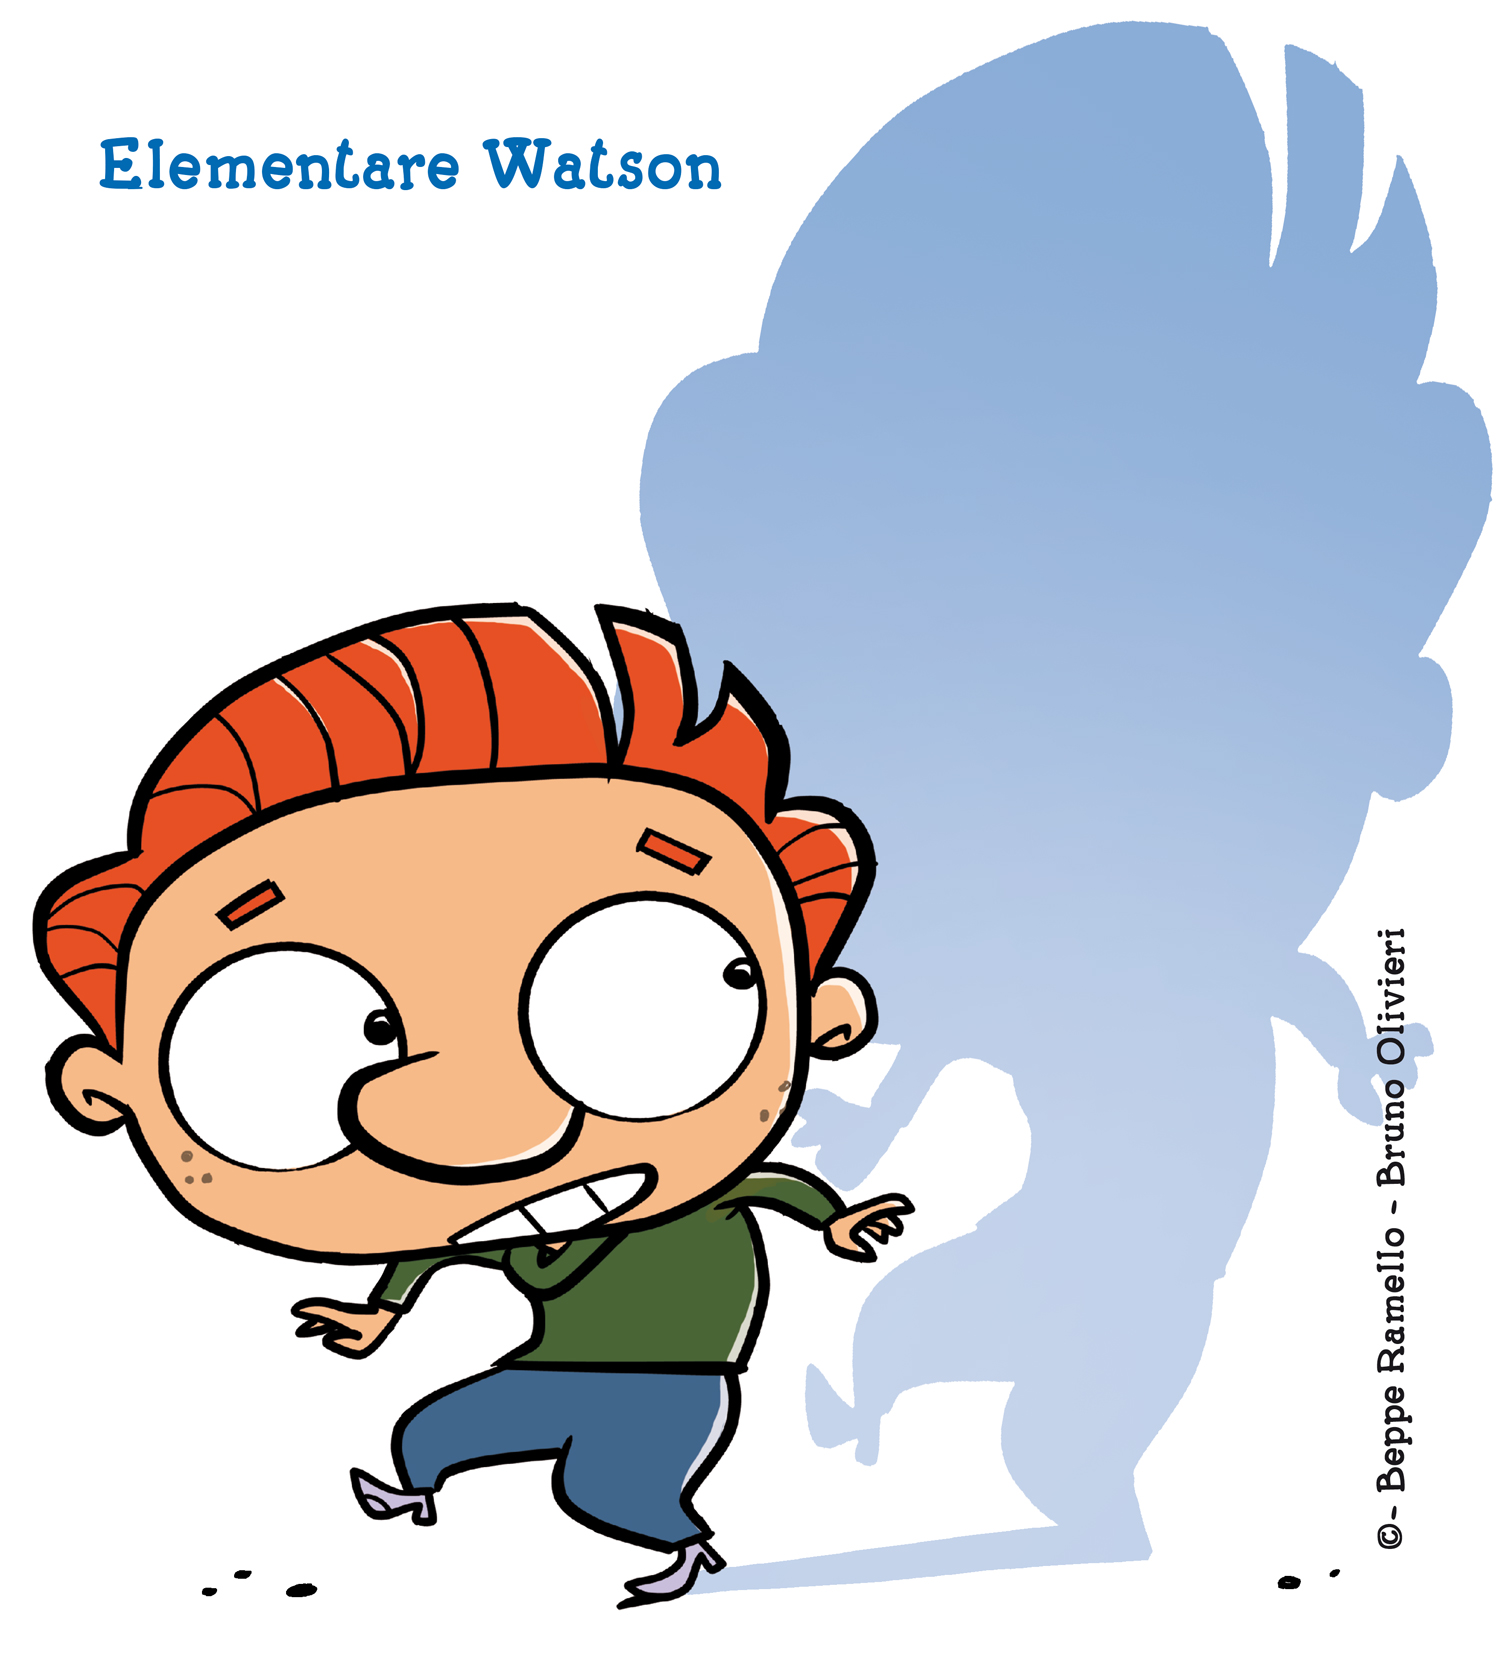 Elementare Watson, Buno Olivieri